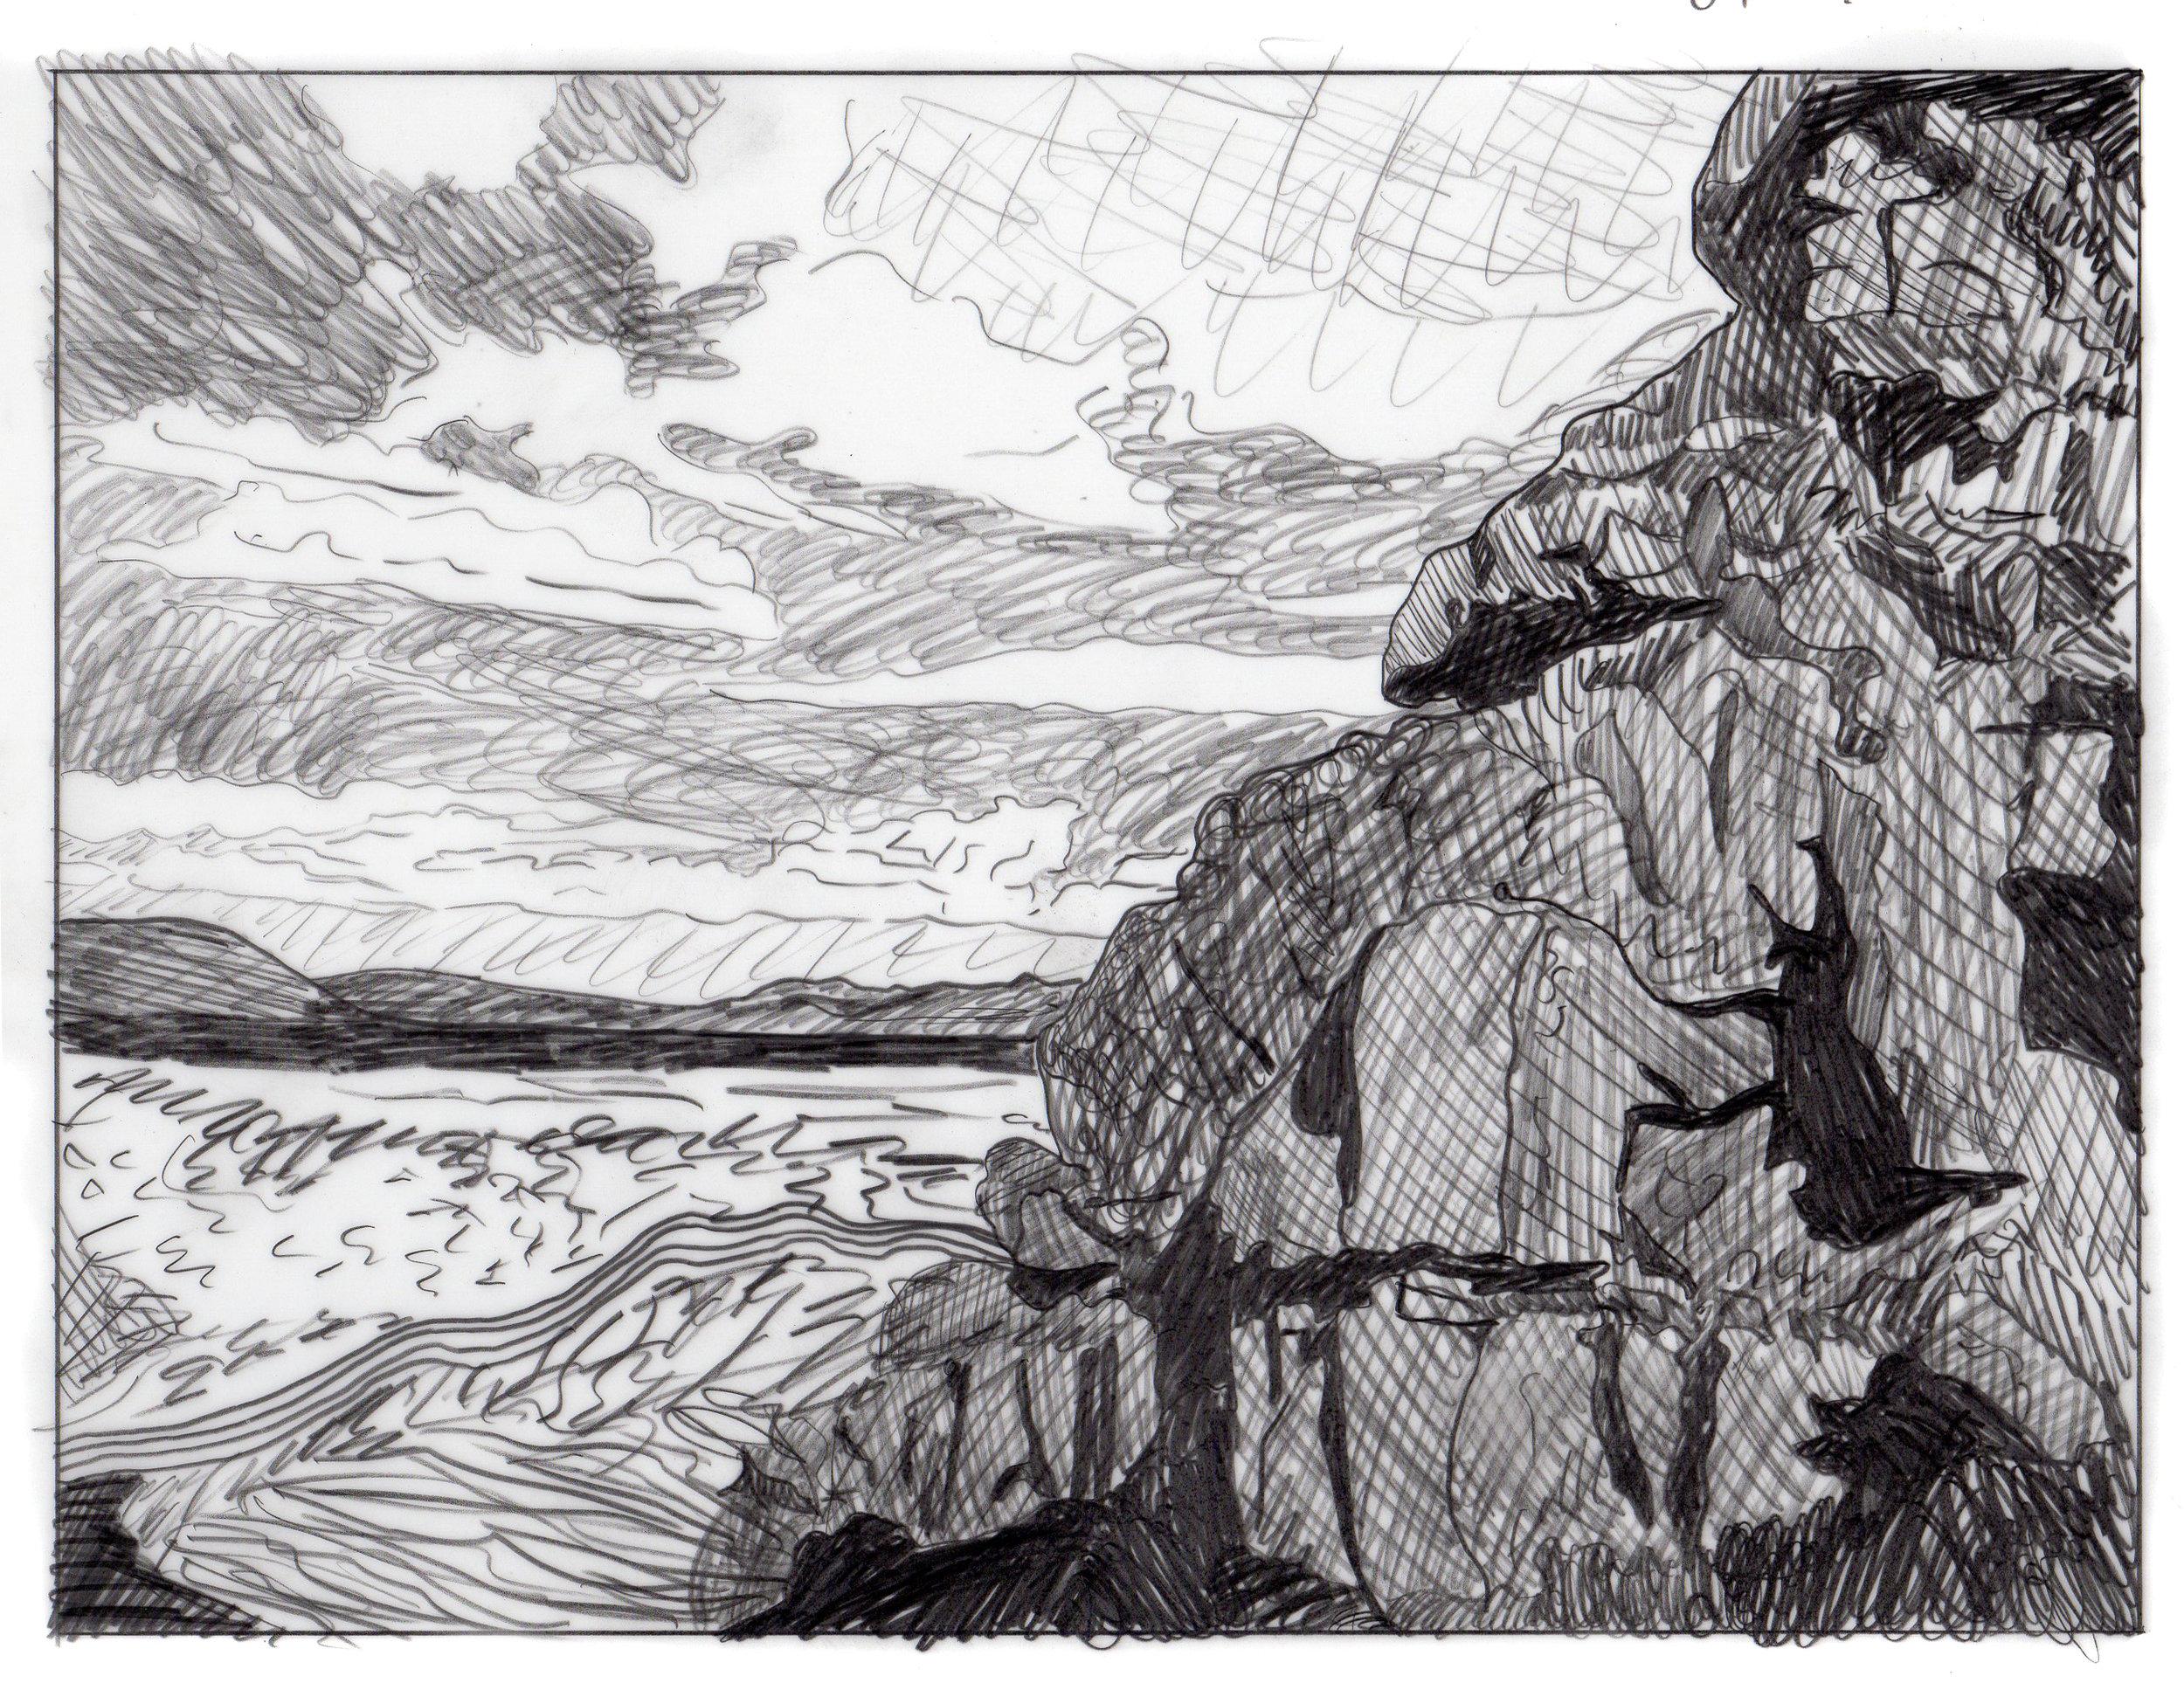 Bricks and Stones May Break (Iceland/Thingvellir)